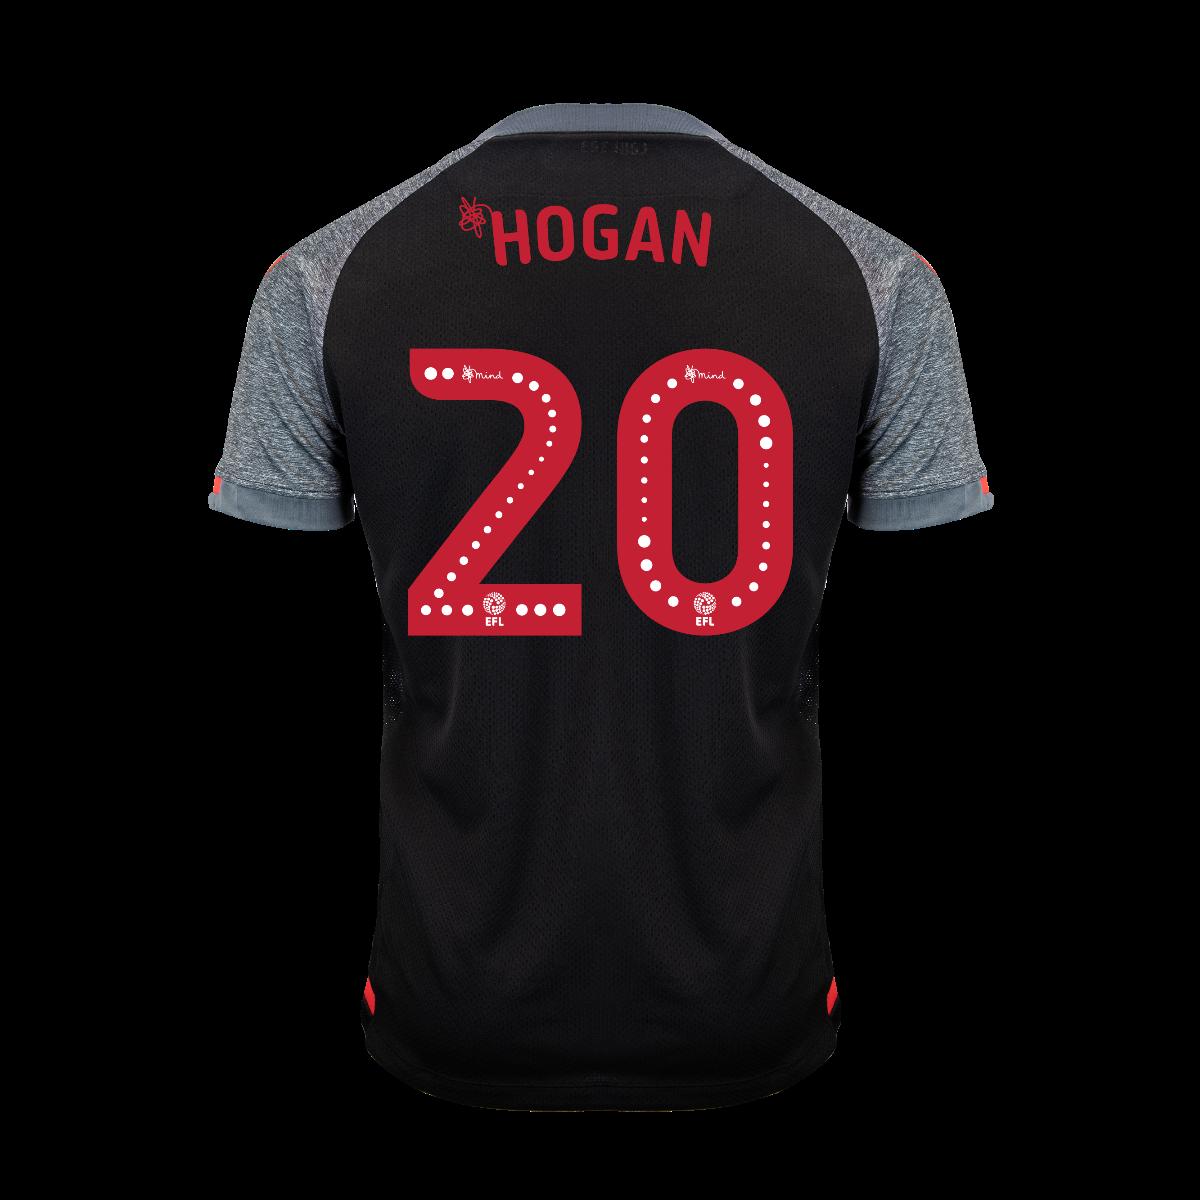 2019/20 Adult Away SS Shirt - Hogan